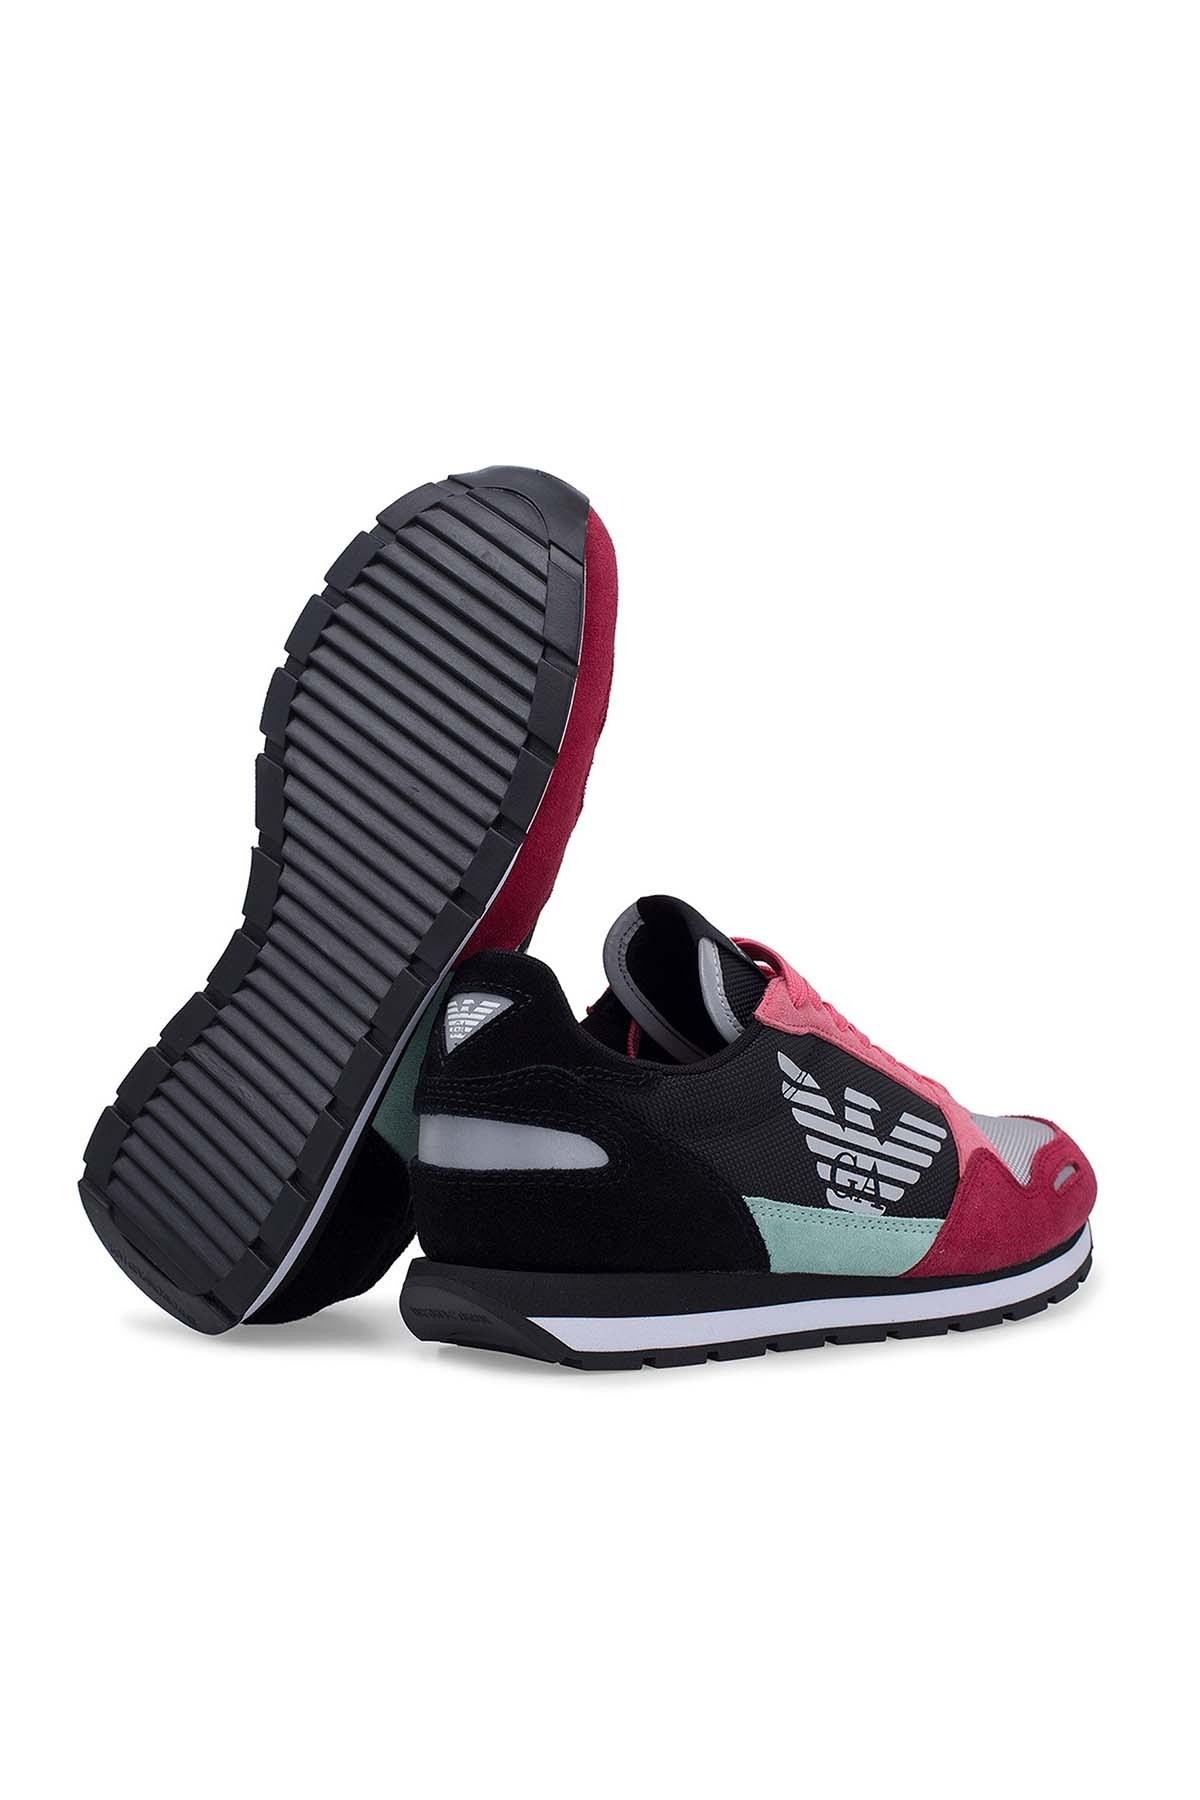 Emporio Armani Bayan Ayakkabı S X3X058 XL481 R528 SİYAH-PEMBE